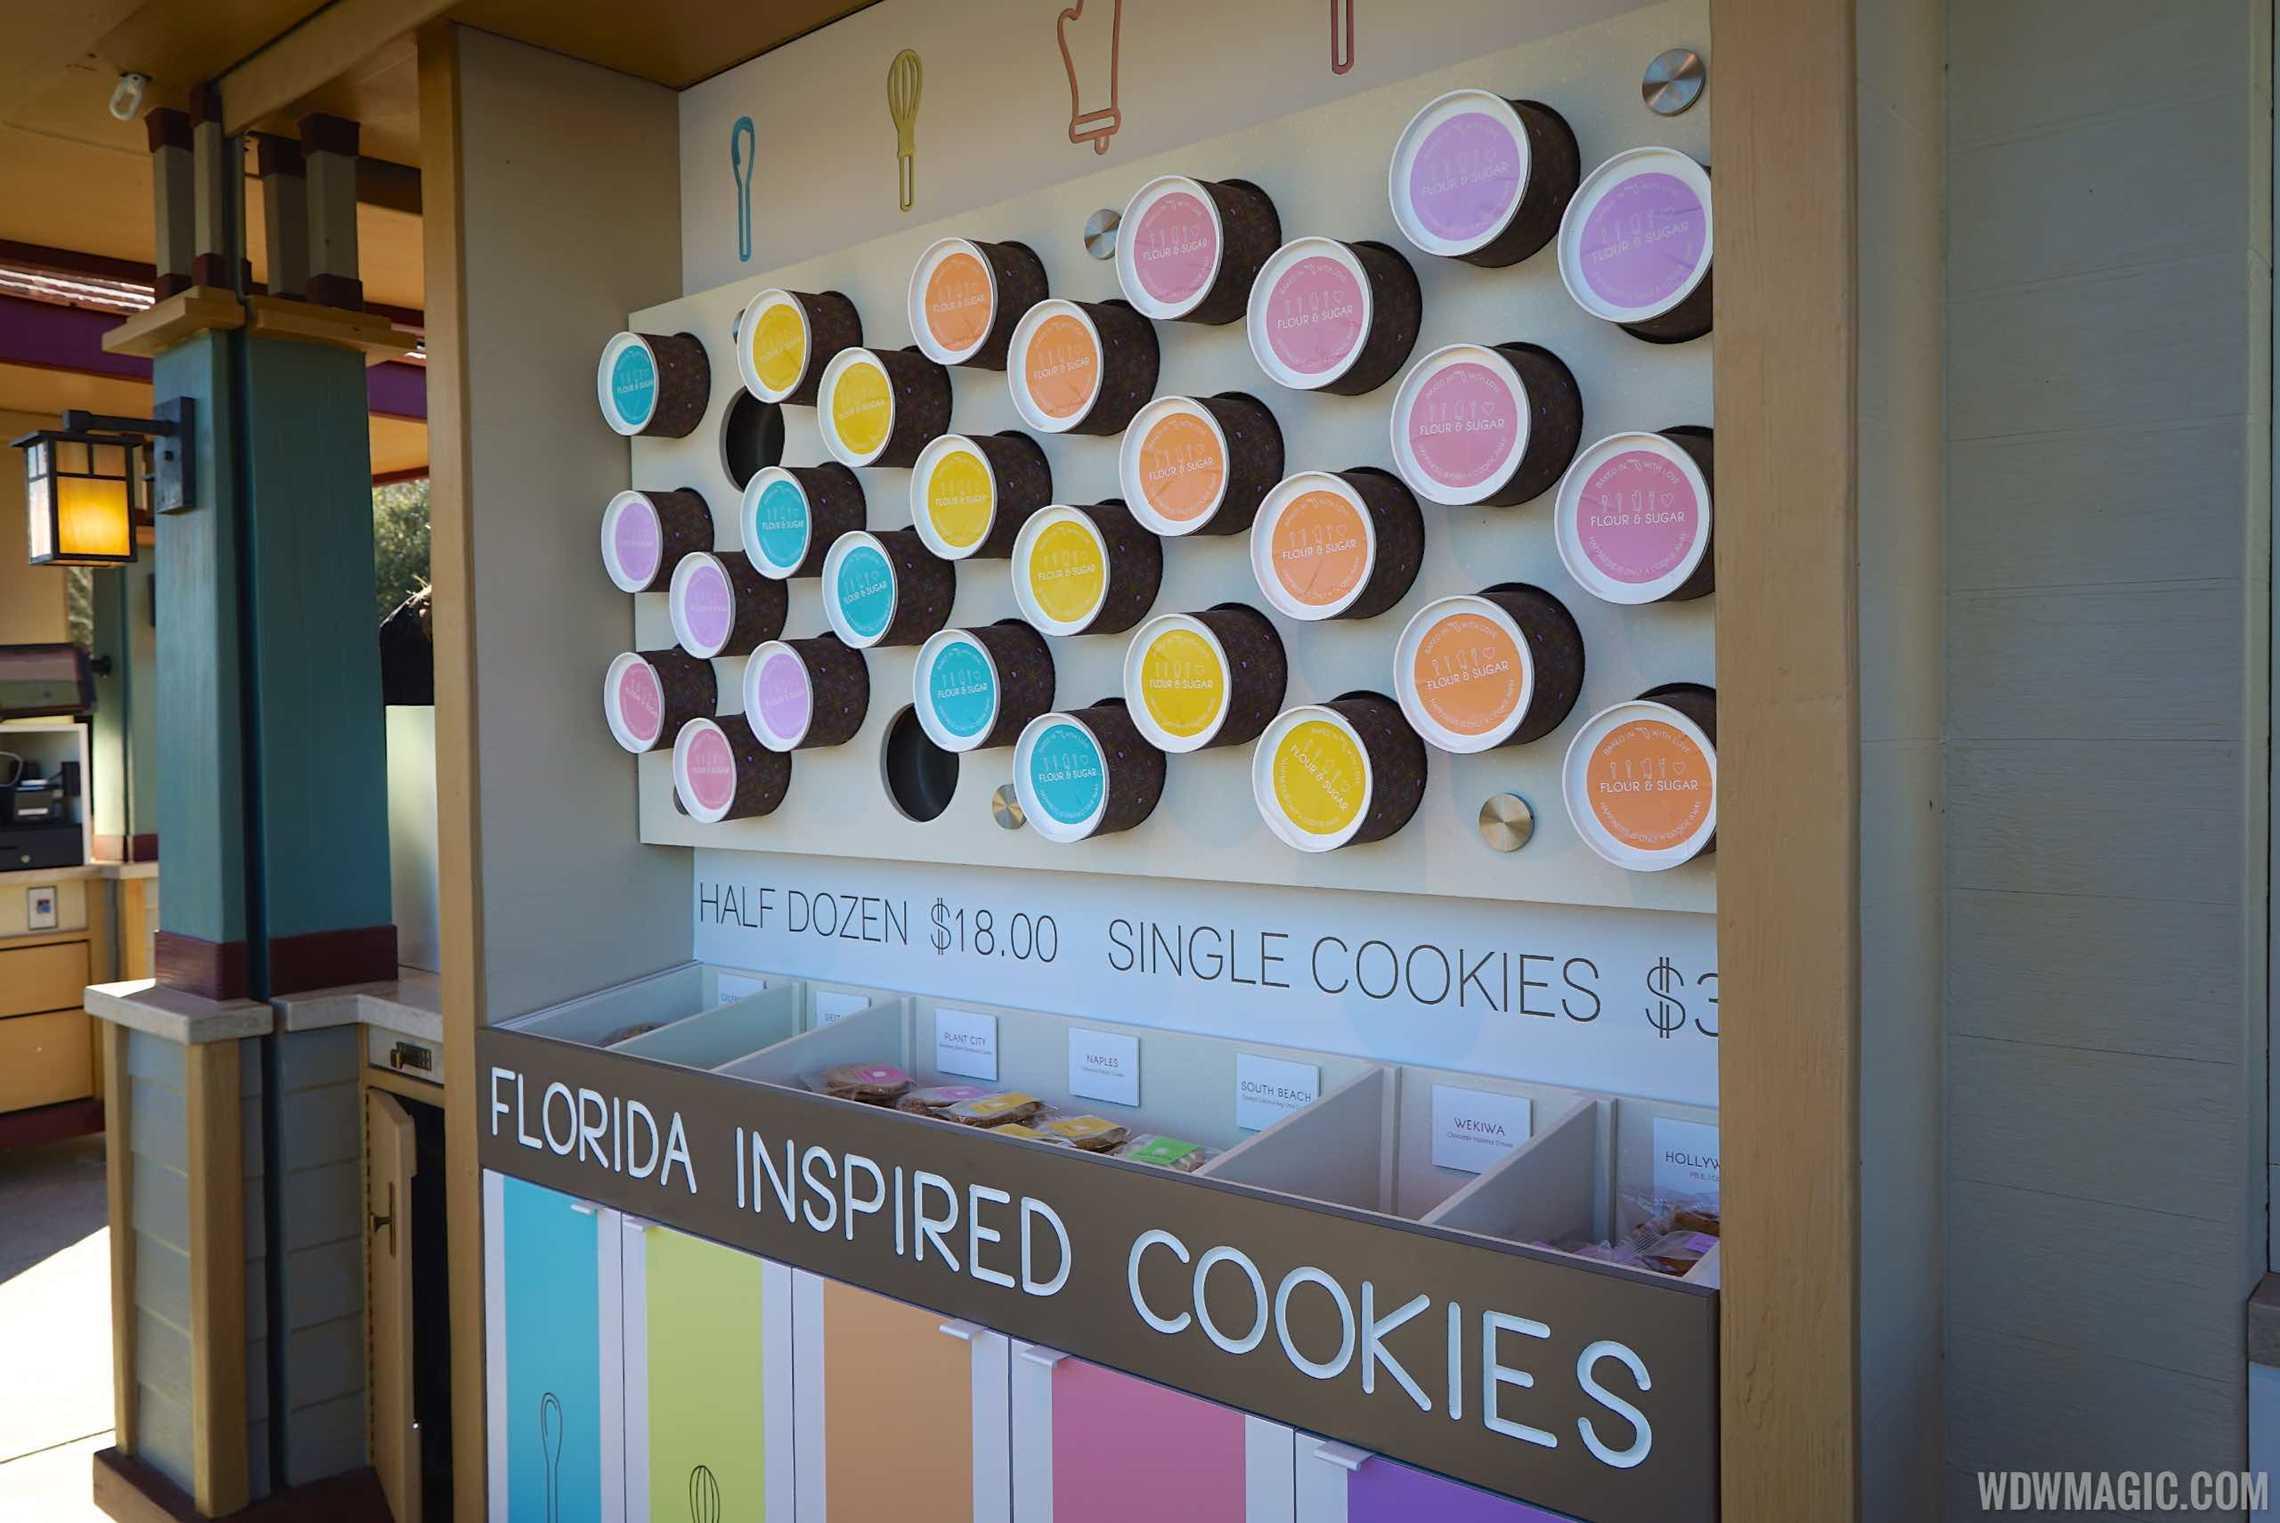 Causeway Kiosk - Flour and Sugar - Cookie Display